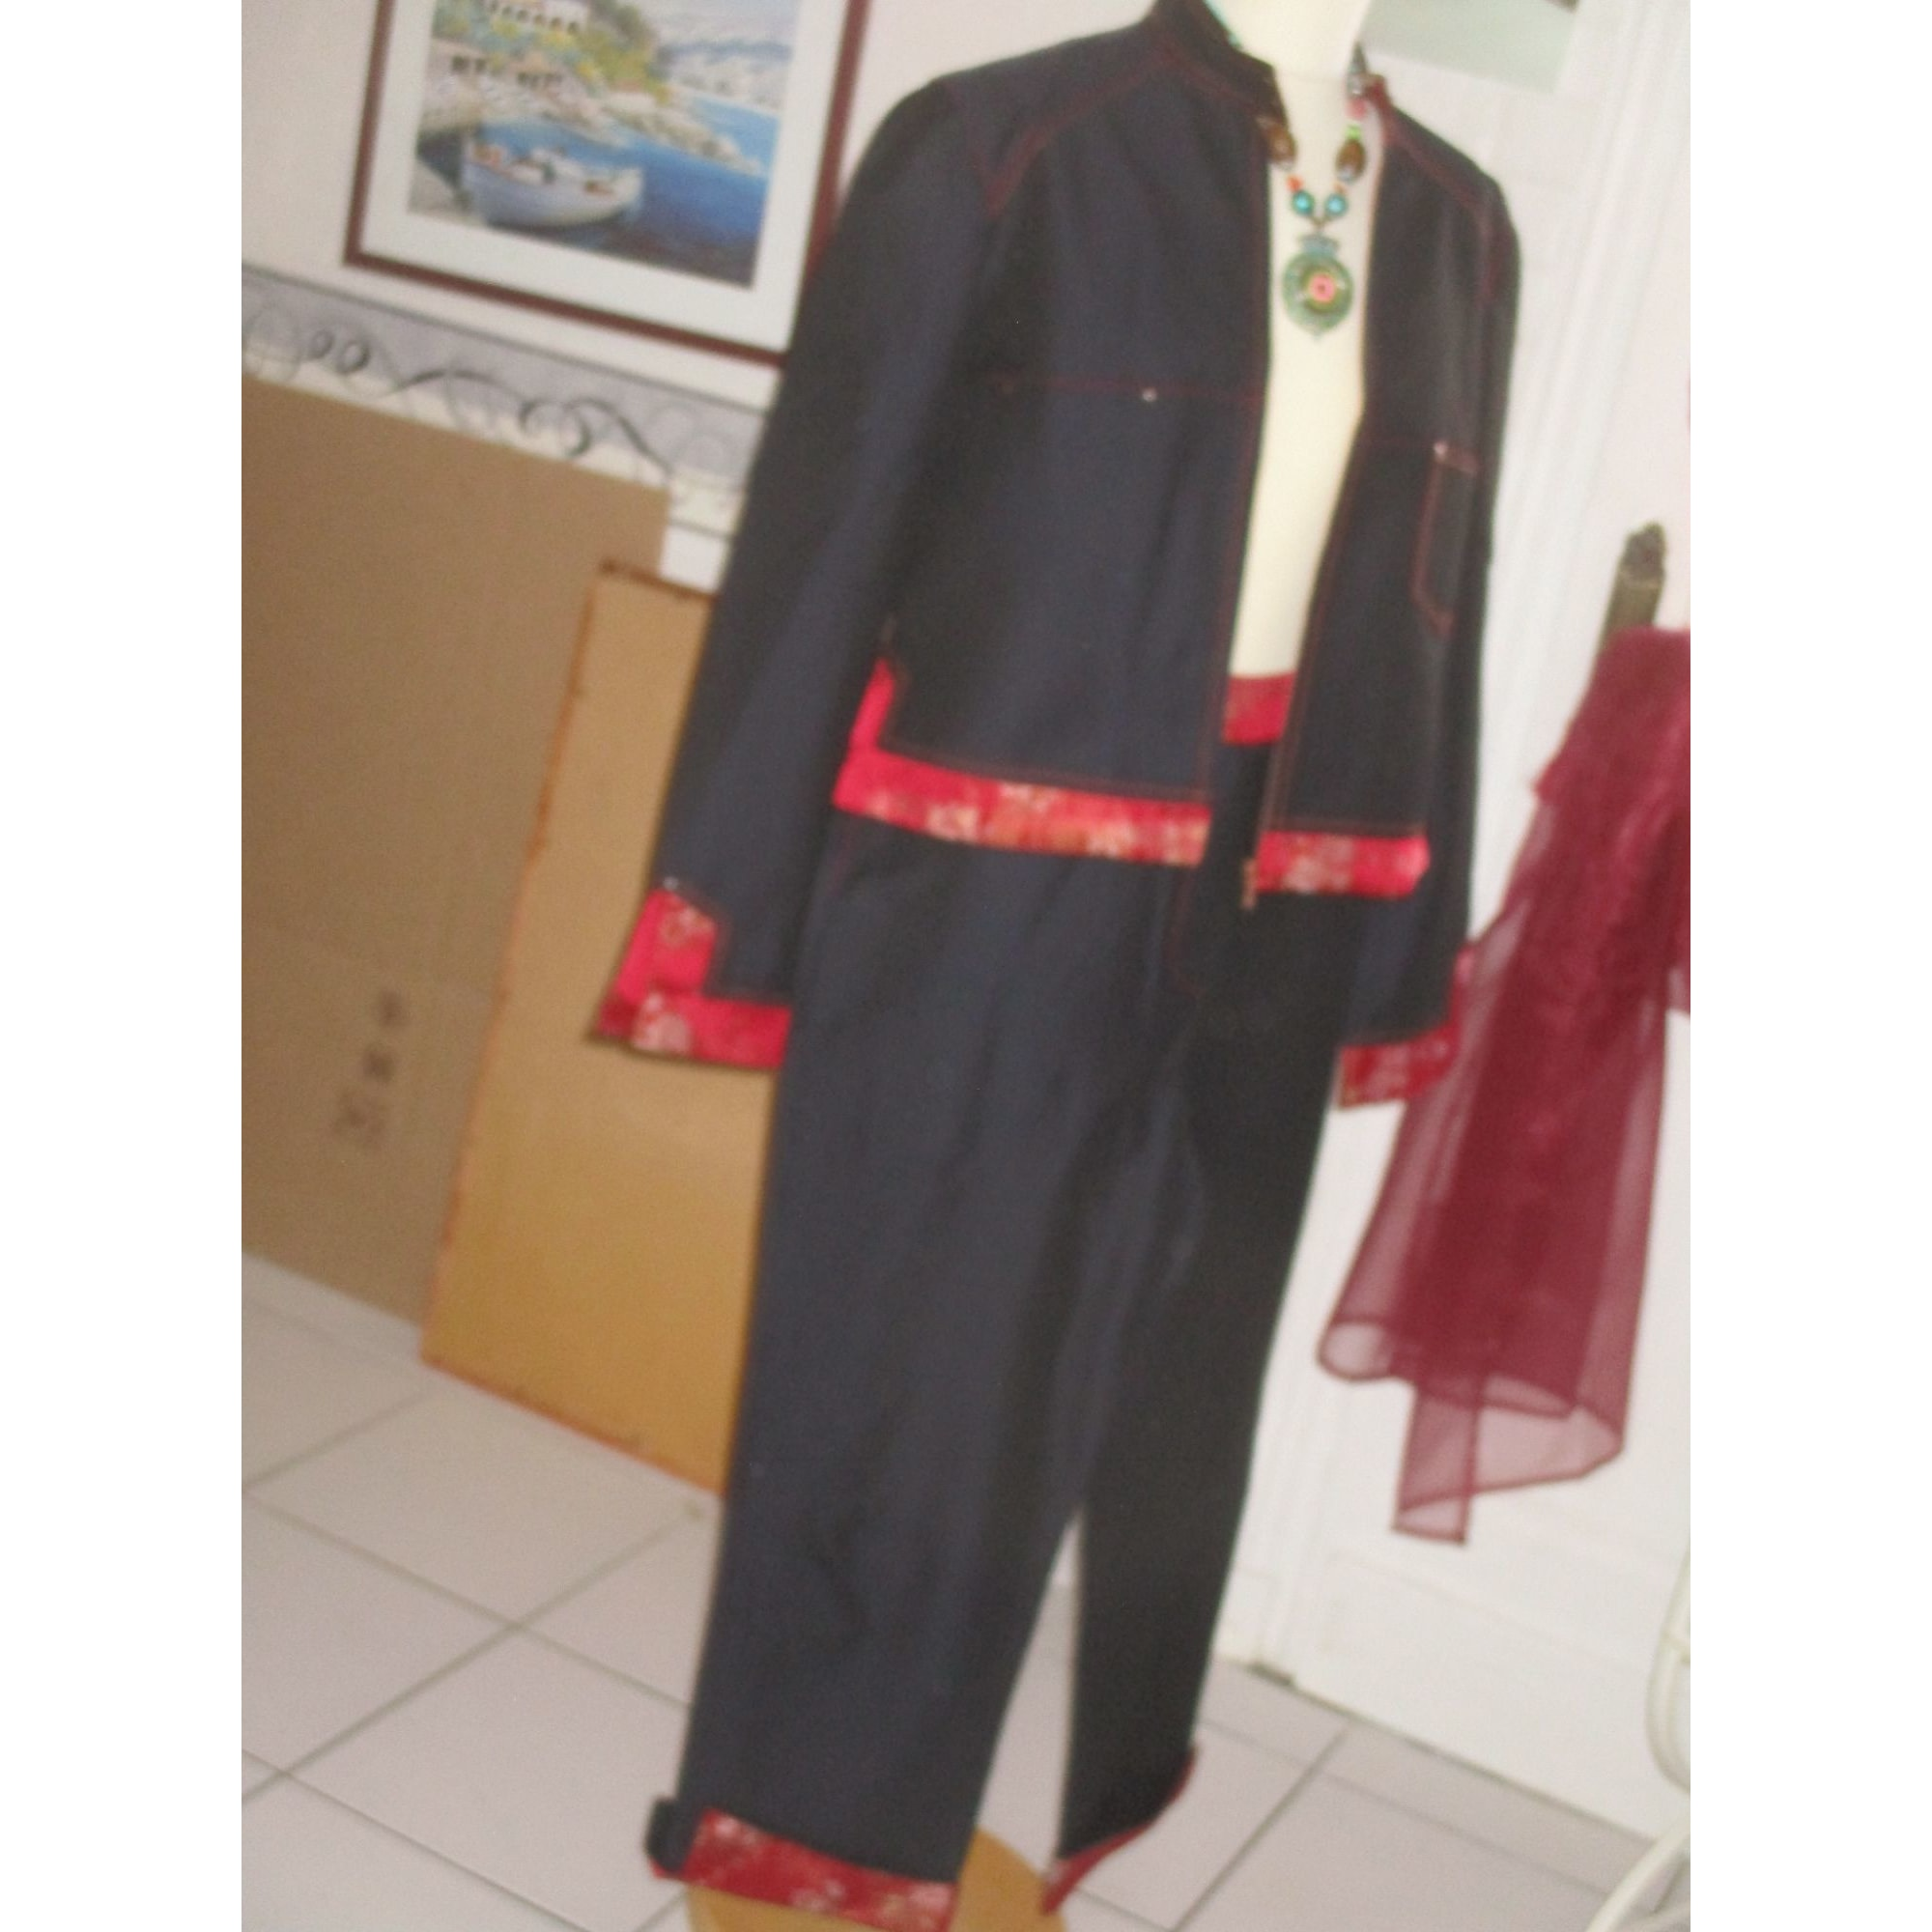 Tailleur pantalon ALAIN MANOUKIAN anthracite et rouge